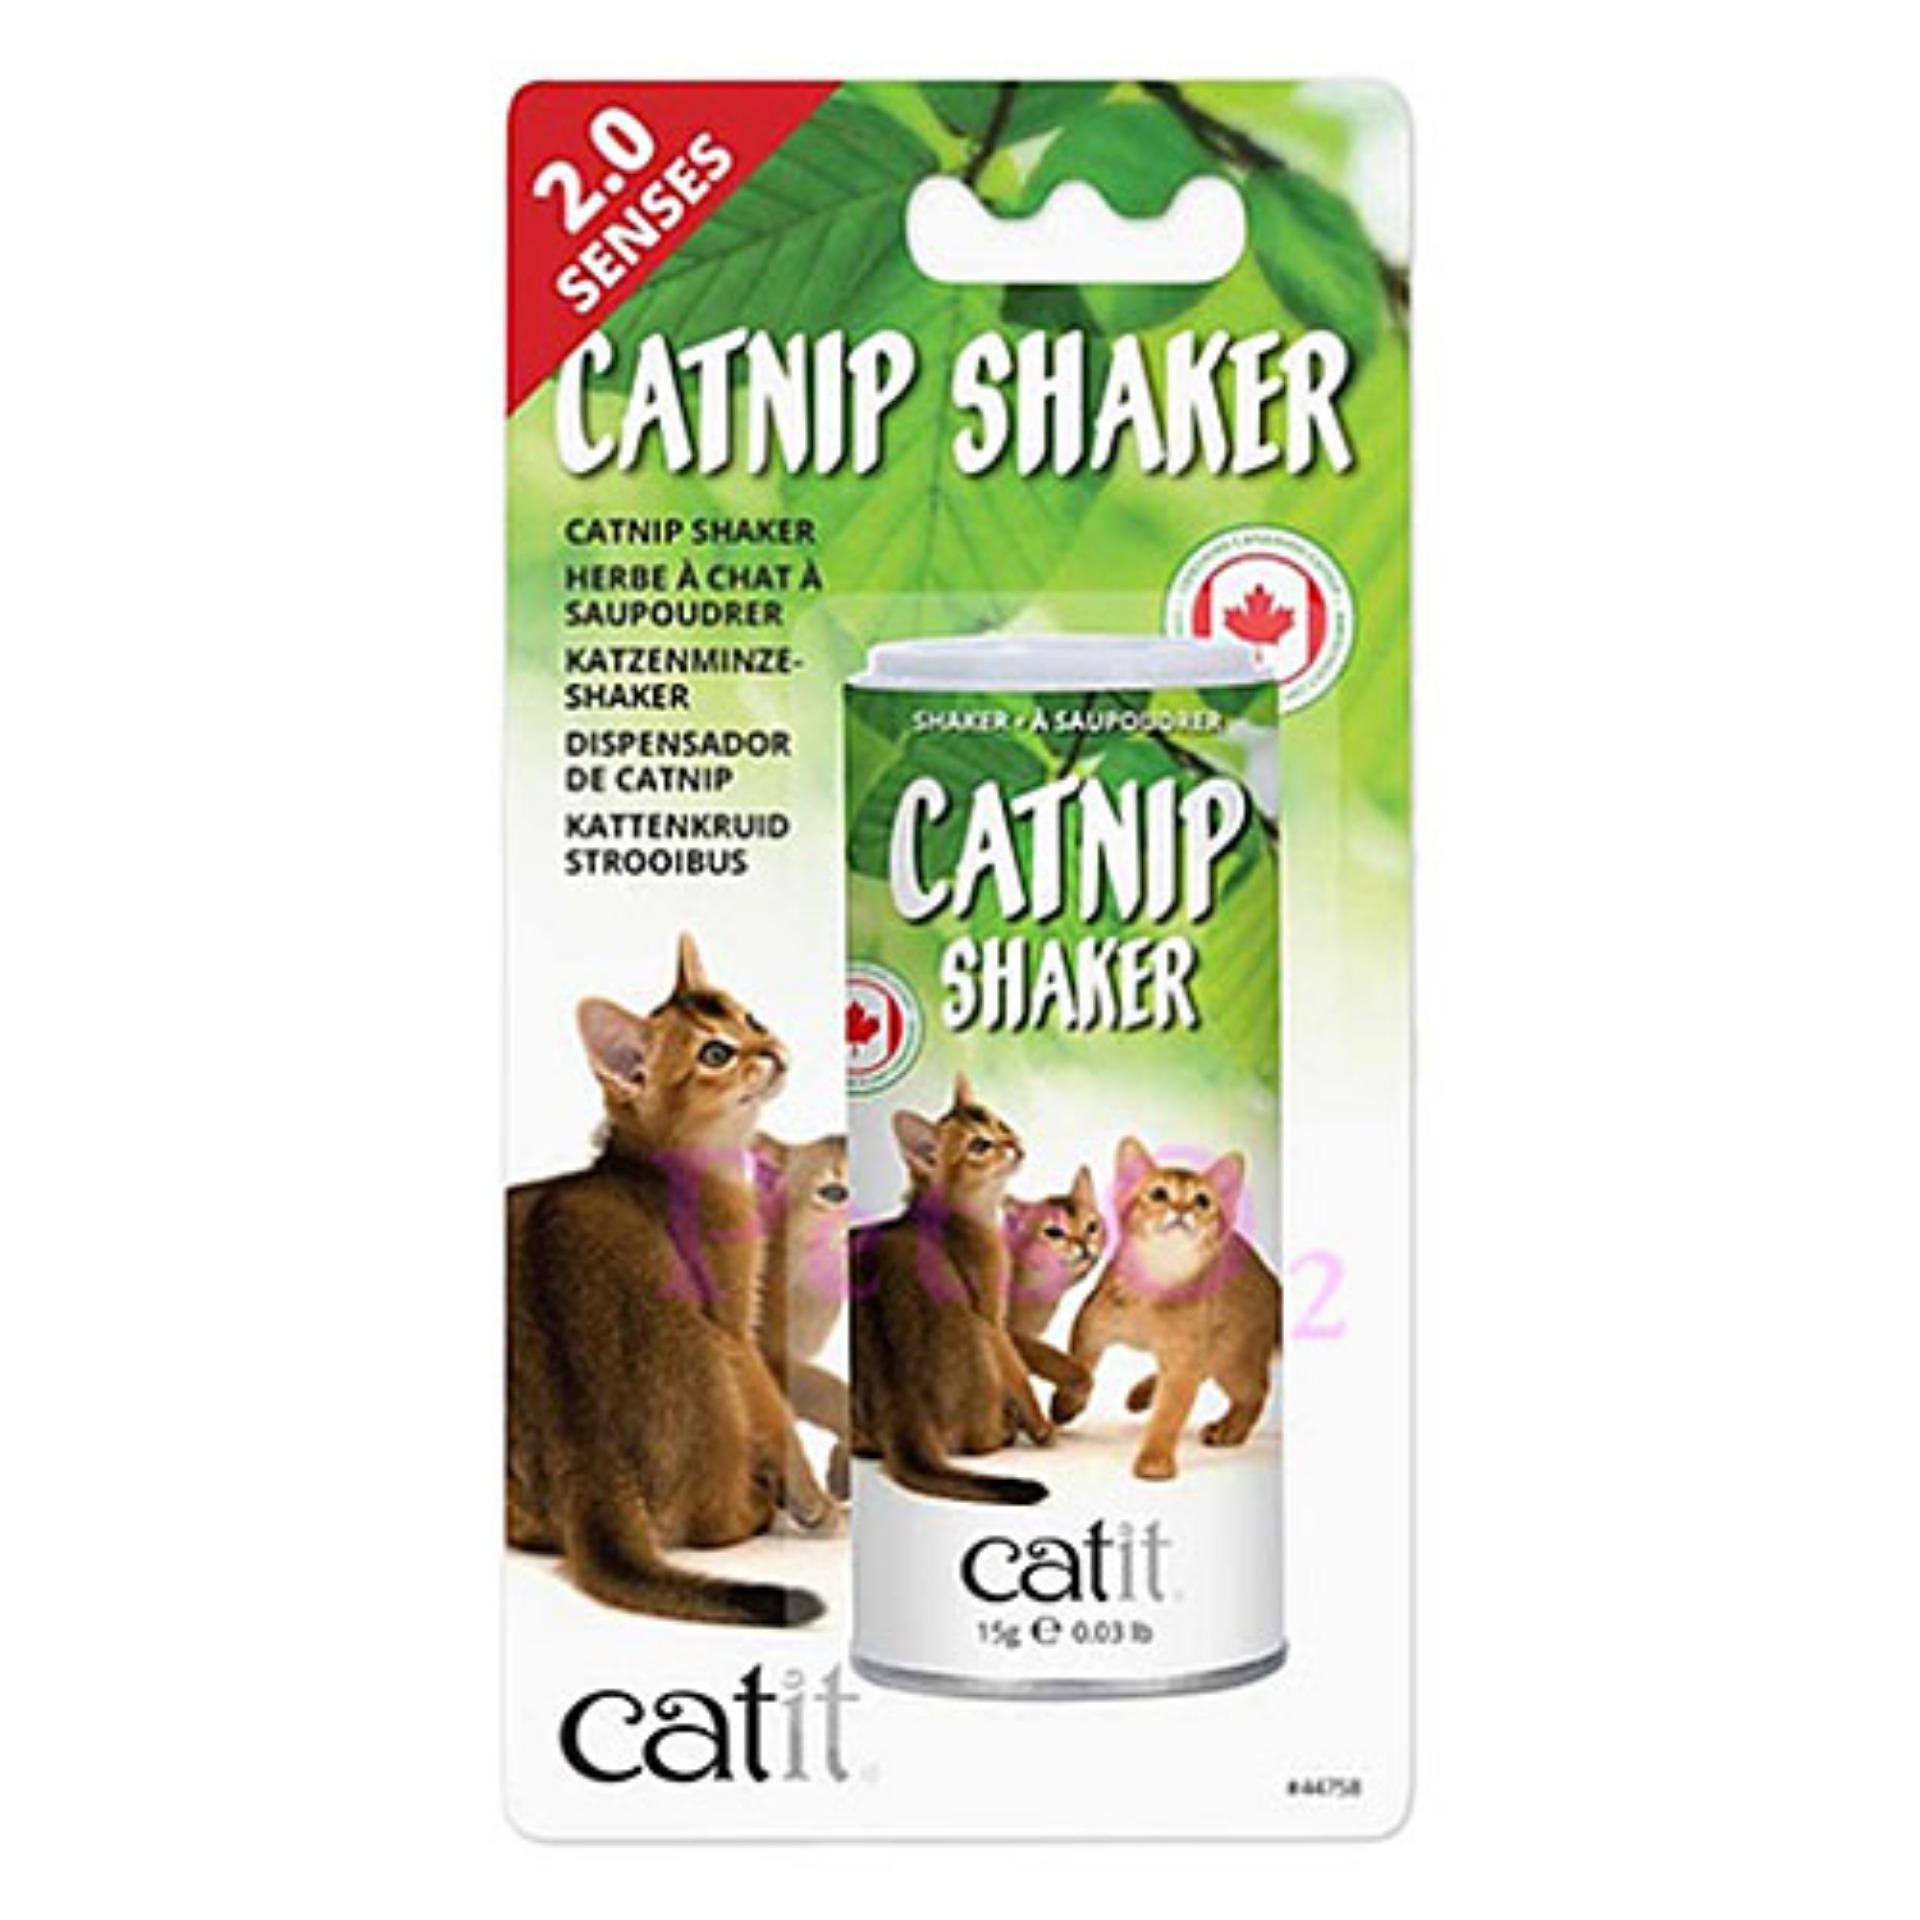 Catit Senses 2.0 Catnip Shaker 30g By Petso2.